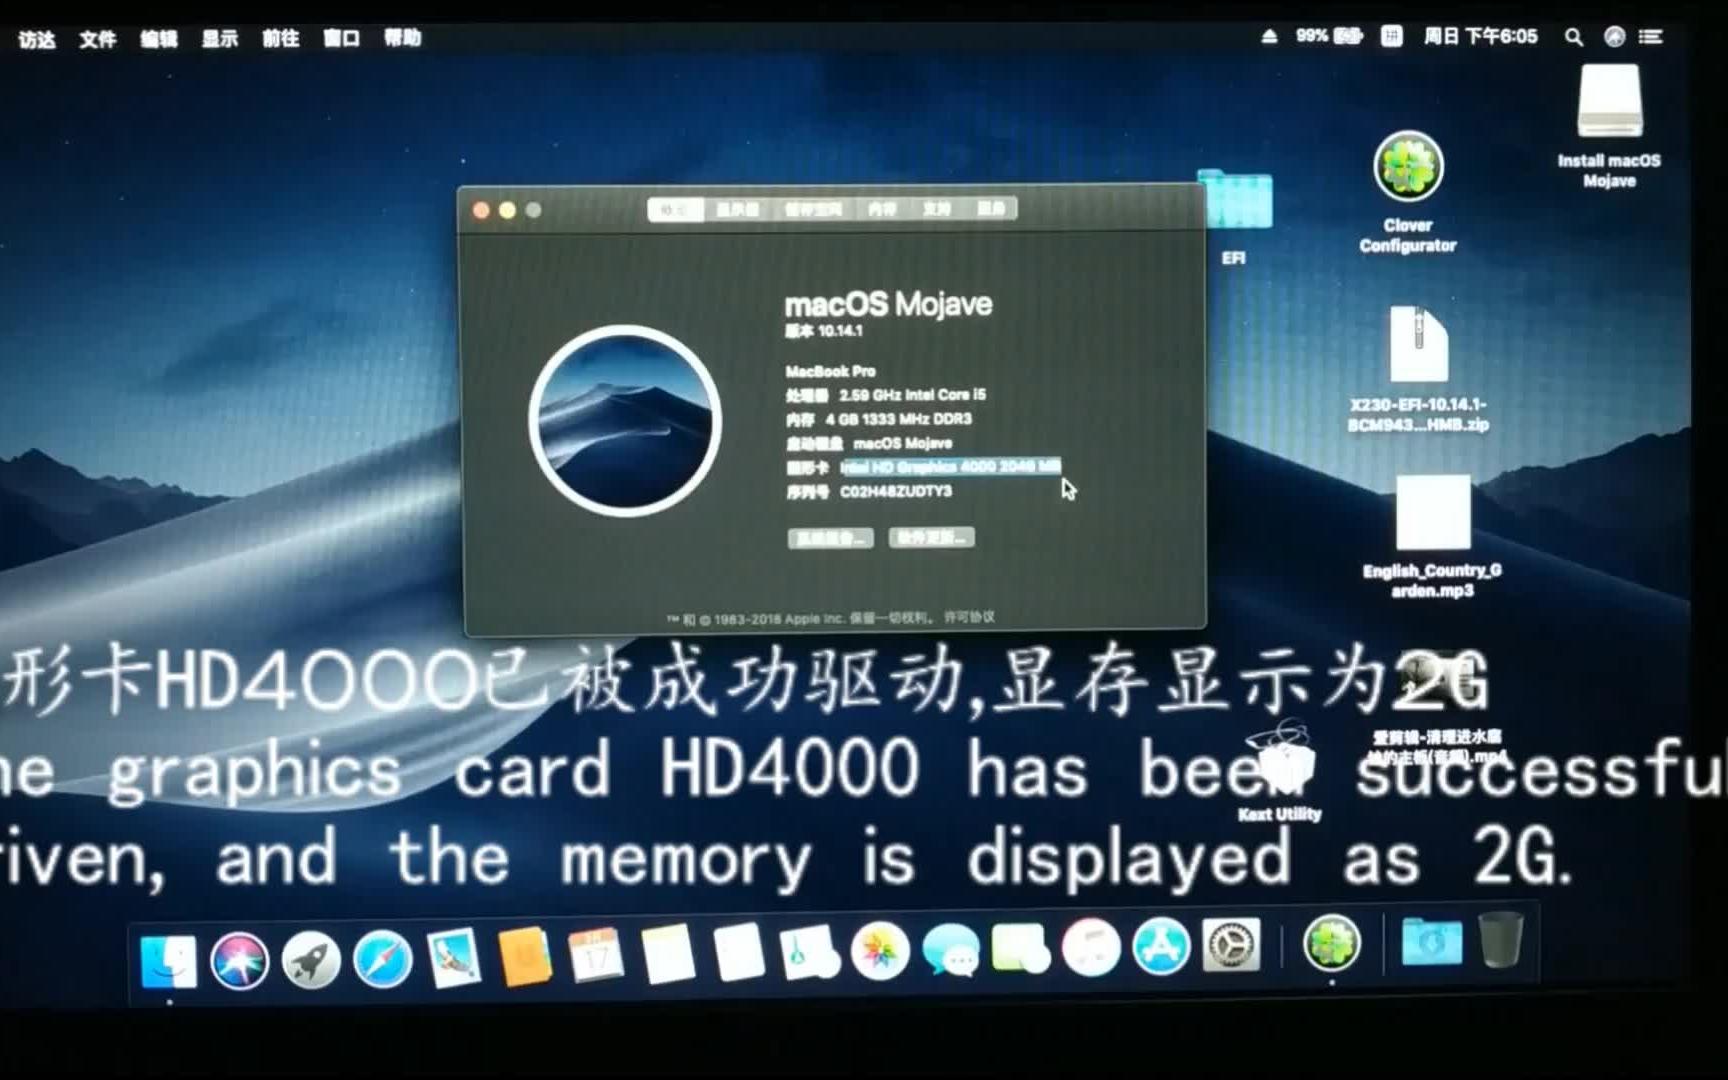 ThinkPad X230黑苹果 完美安装最新macOS Mojave玩起来溜不溜?_哔哩哔哩 (゜-゜)つロ 干杯~-bilibili